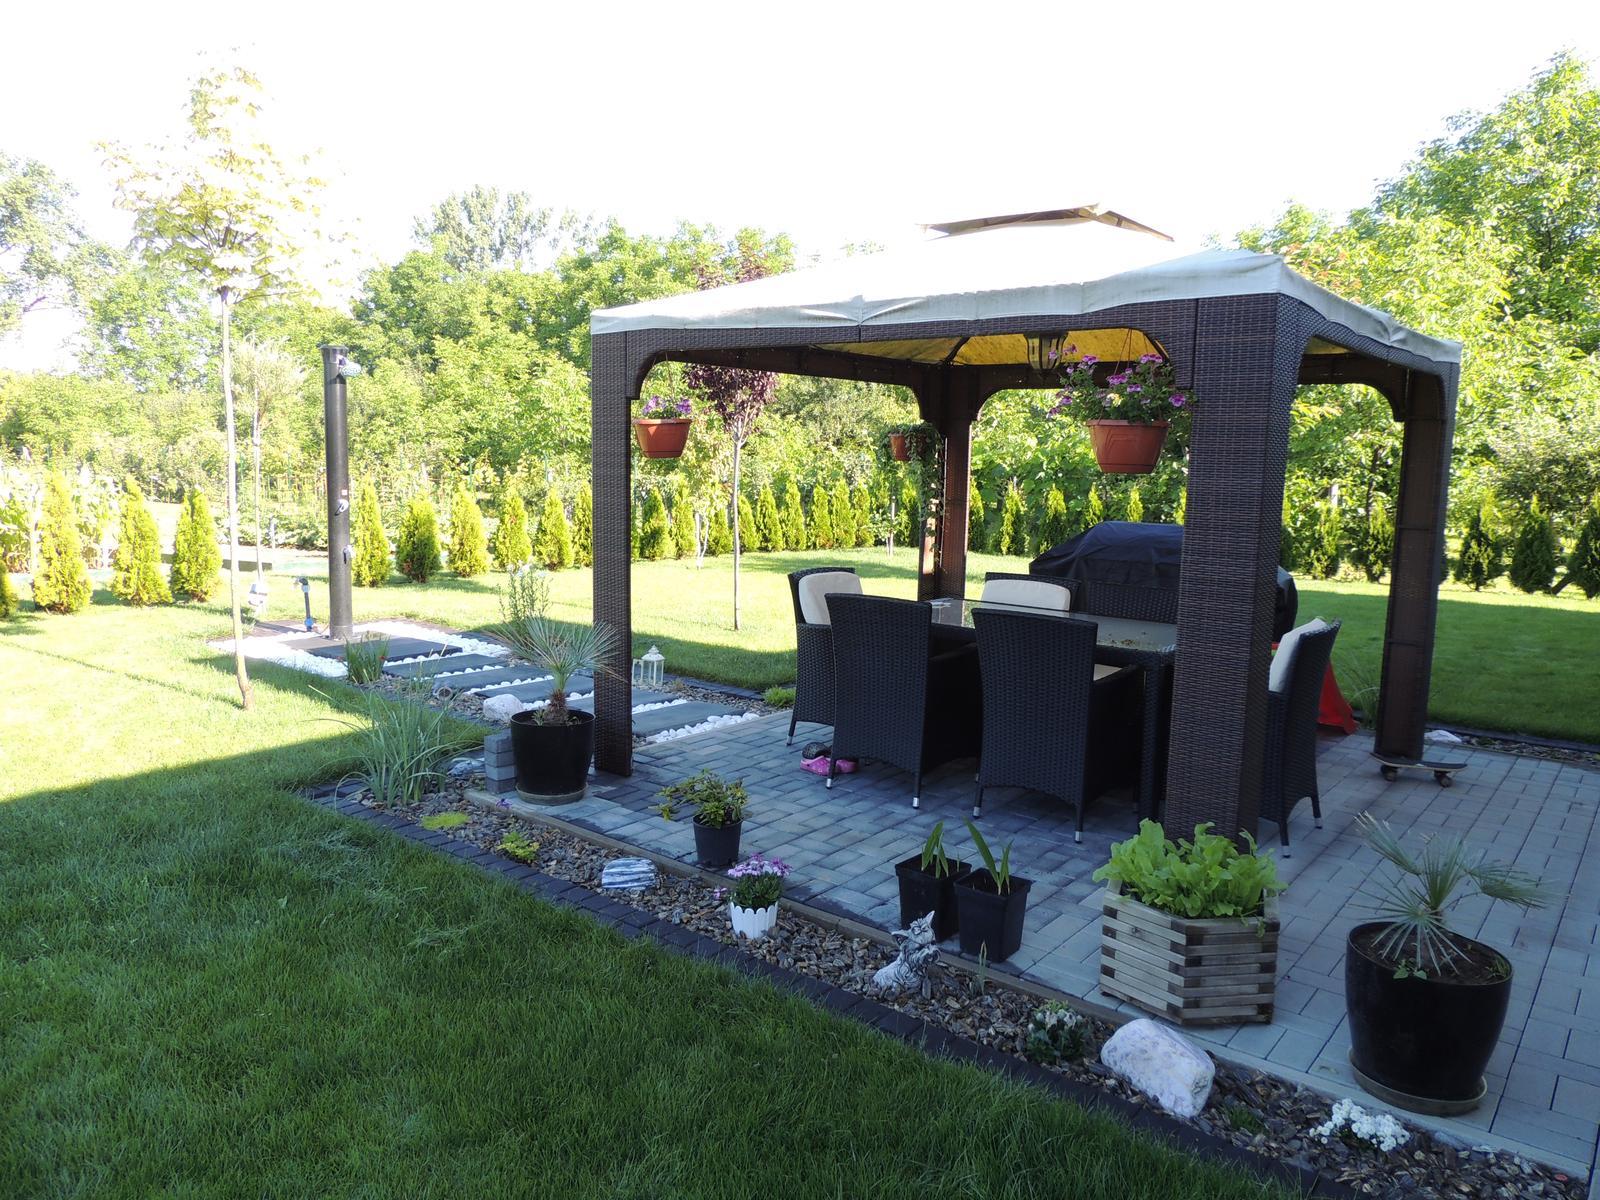 Bungalow 880 - zahradna sprcha hotova este dosadit kvety na jesen a bude to komplet